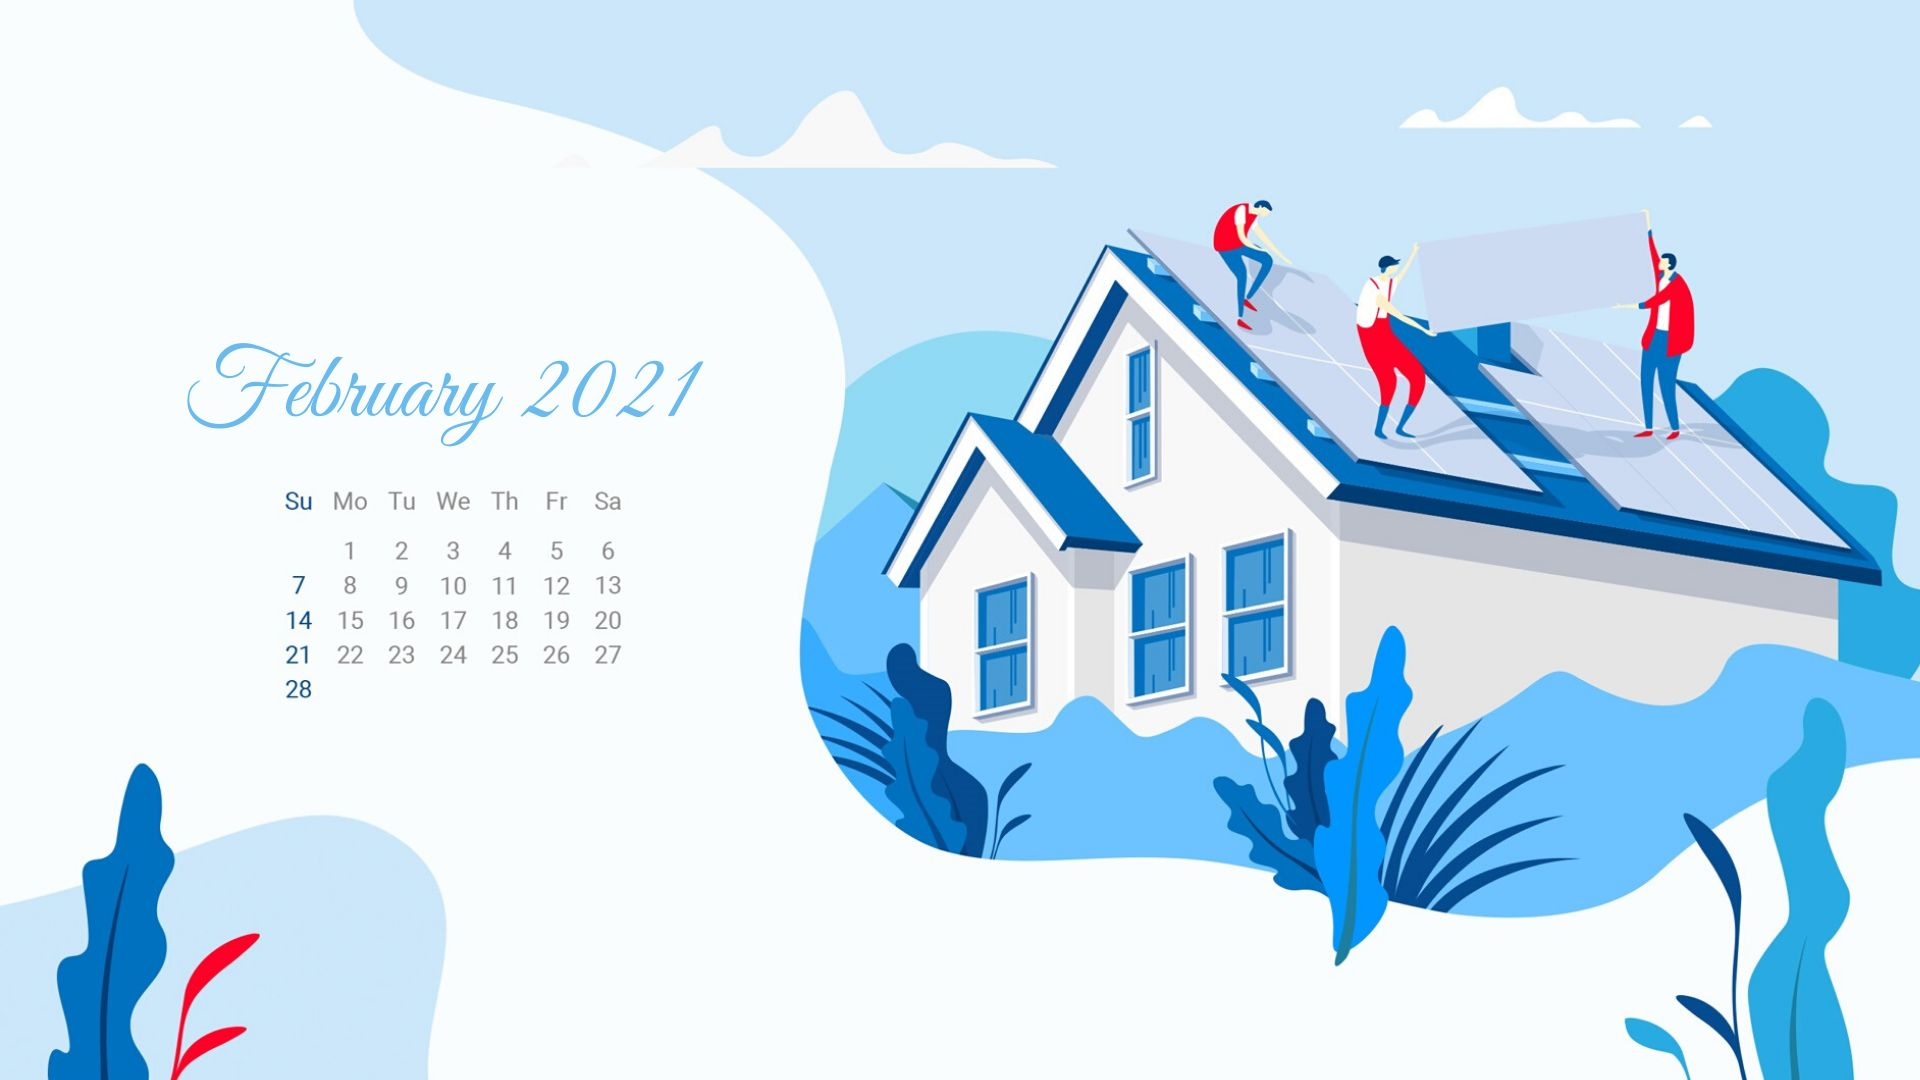 22 Top January 2021 Calendar Desktop Wallpaper Pictures   HD 1920x1080